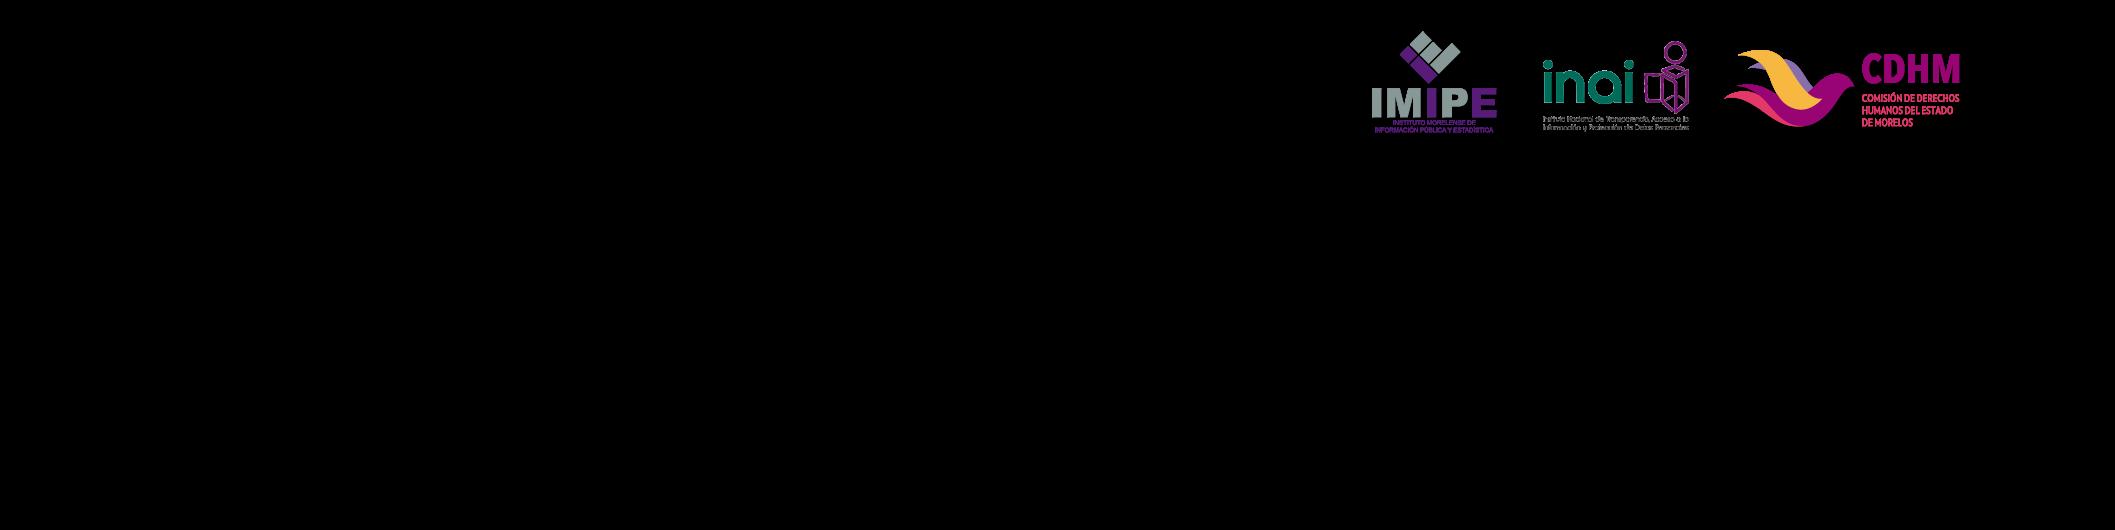 protocoloddhh-pdp_logos.png